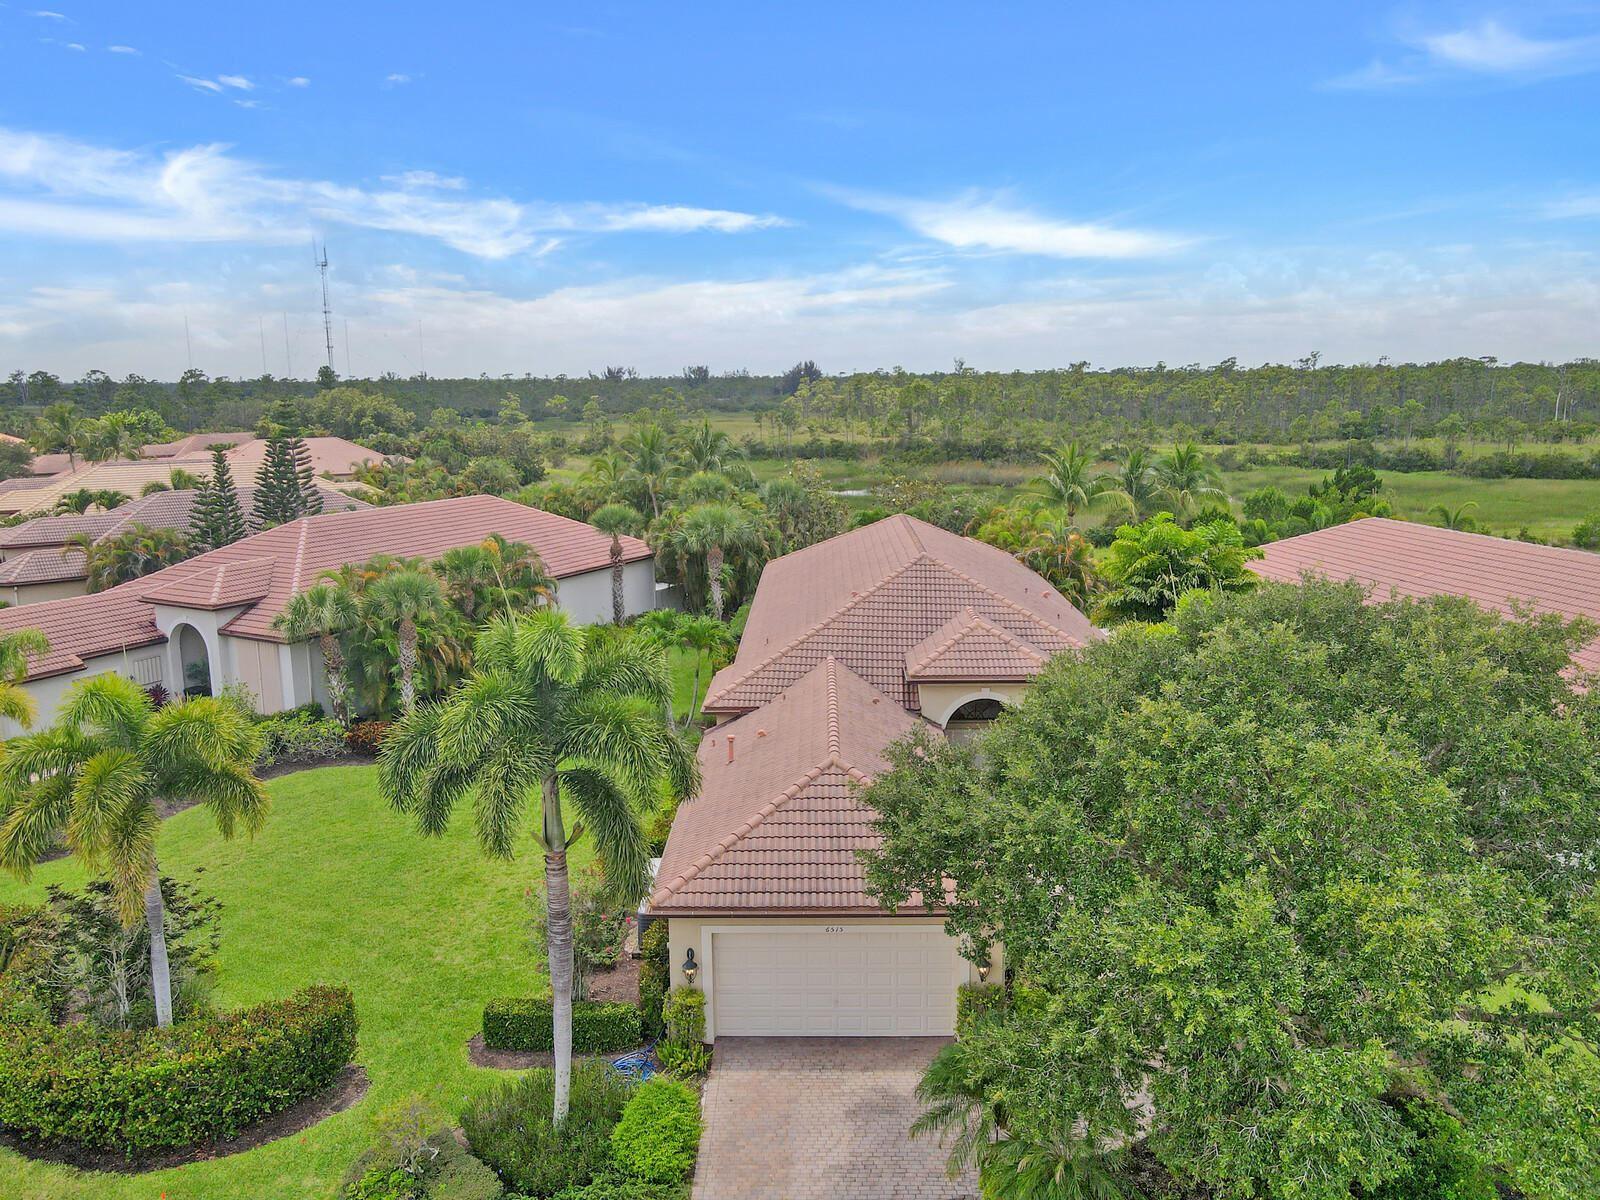 Photo of 6515 Sparrow Hawk Drive, West Palm Beach, FL 33412 (MLS # RX-10733617)